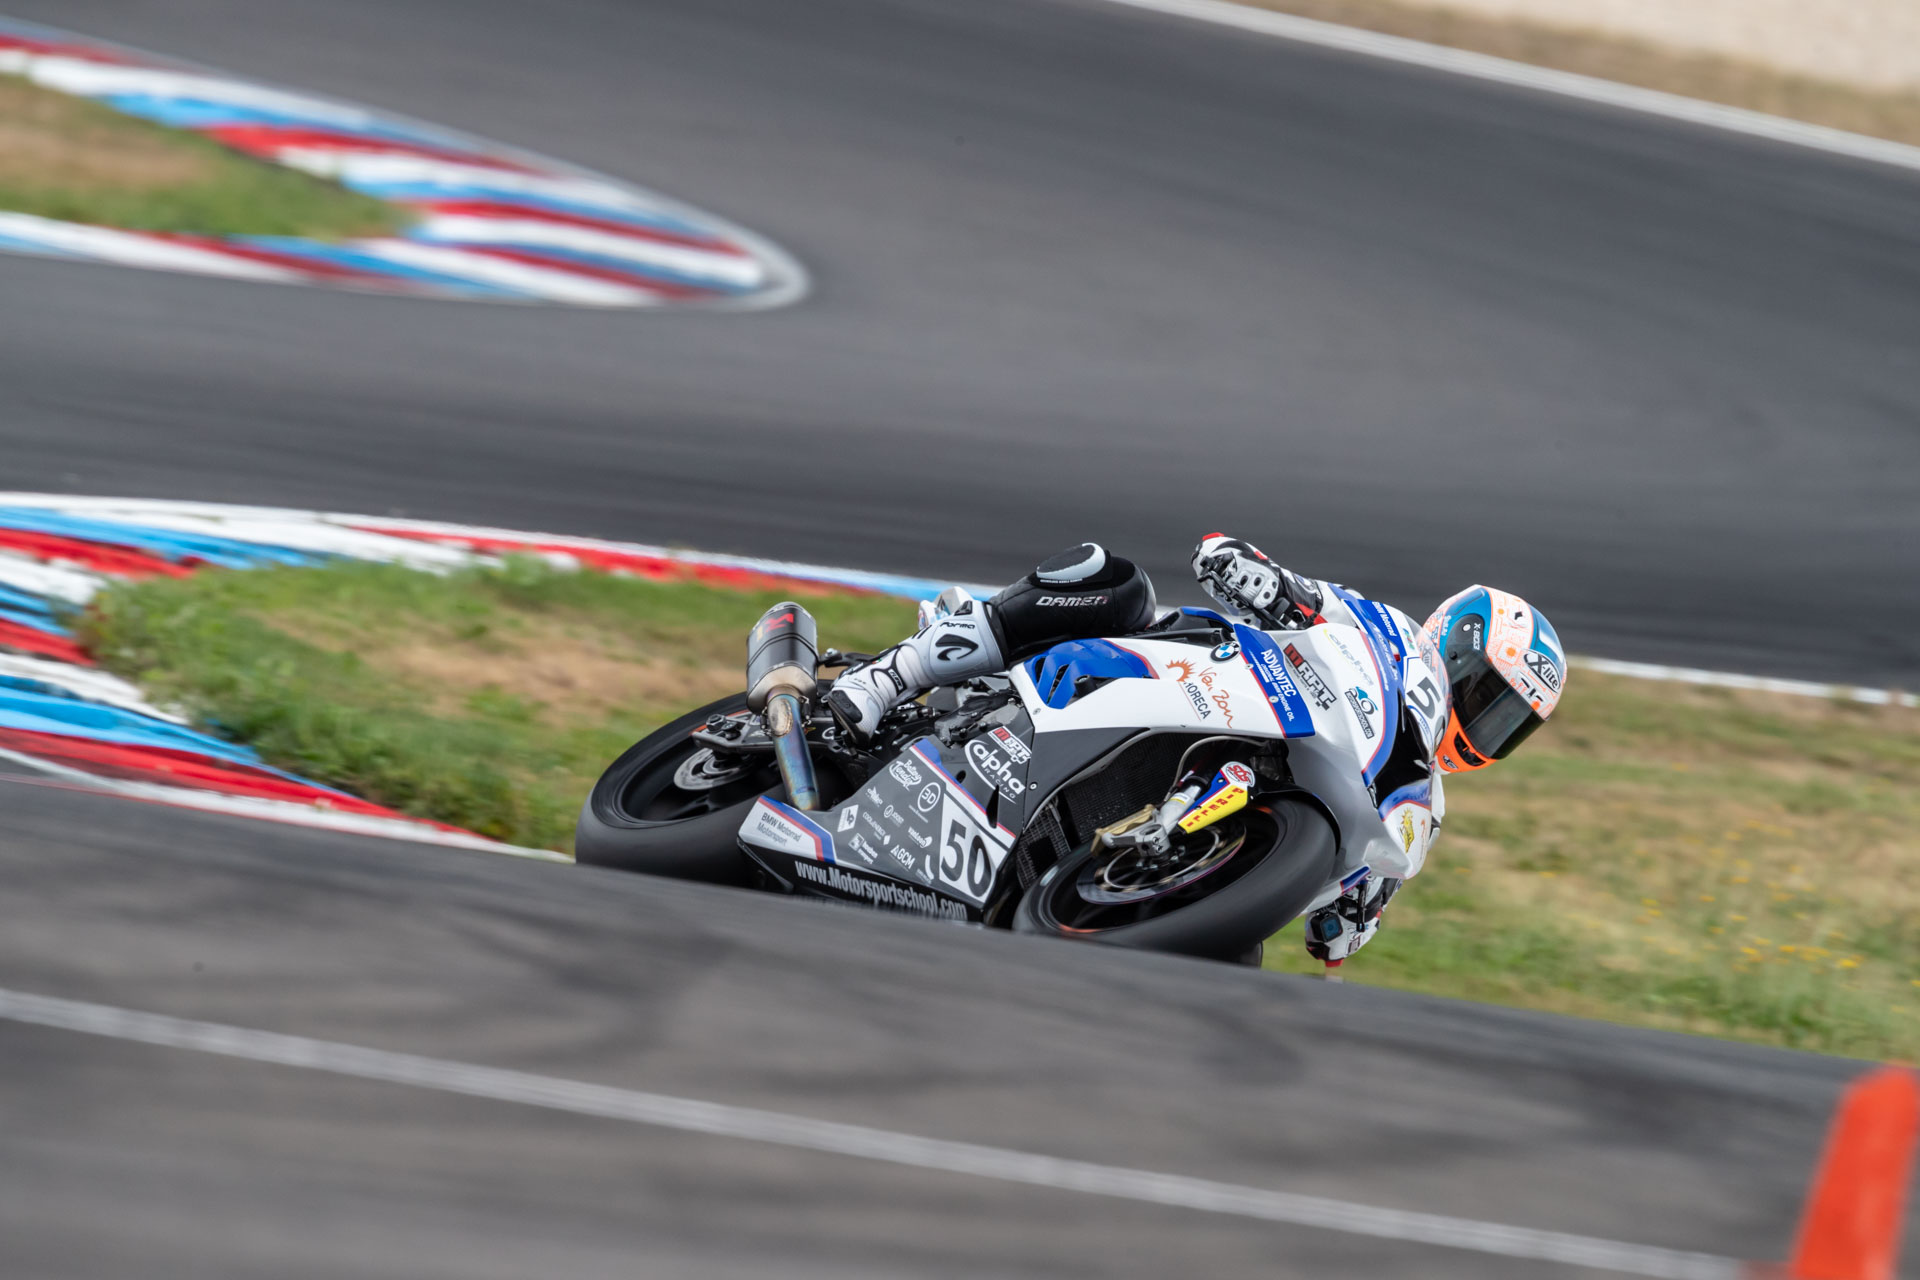 IDM_Lausitzring2018_SBK-Quali-web-30